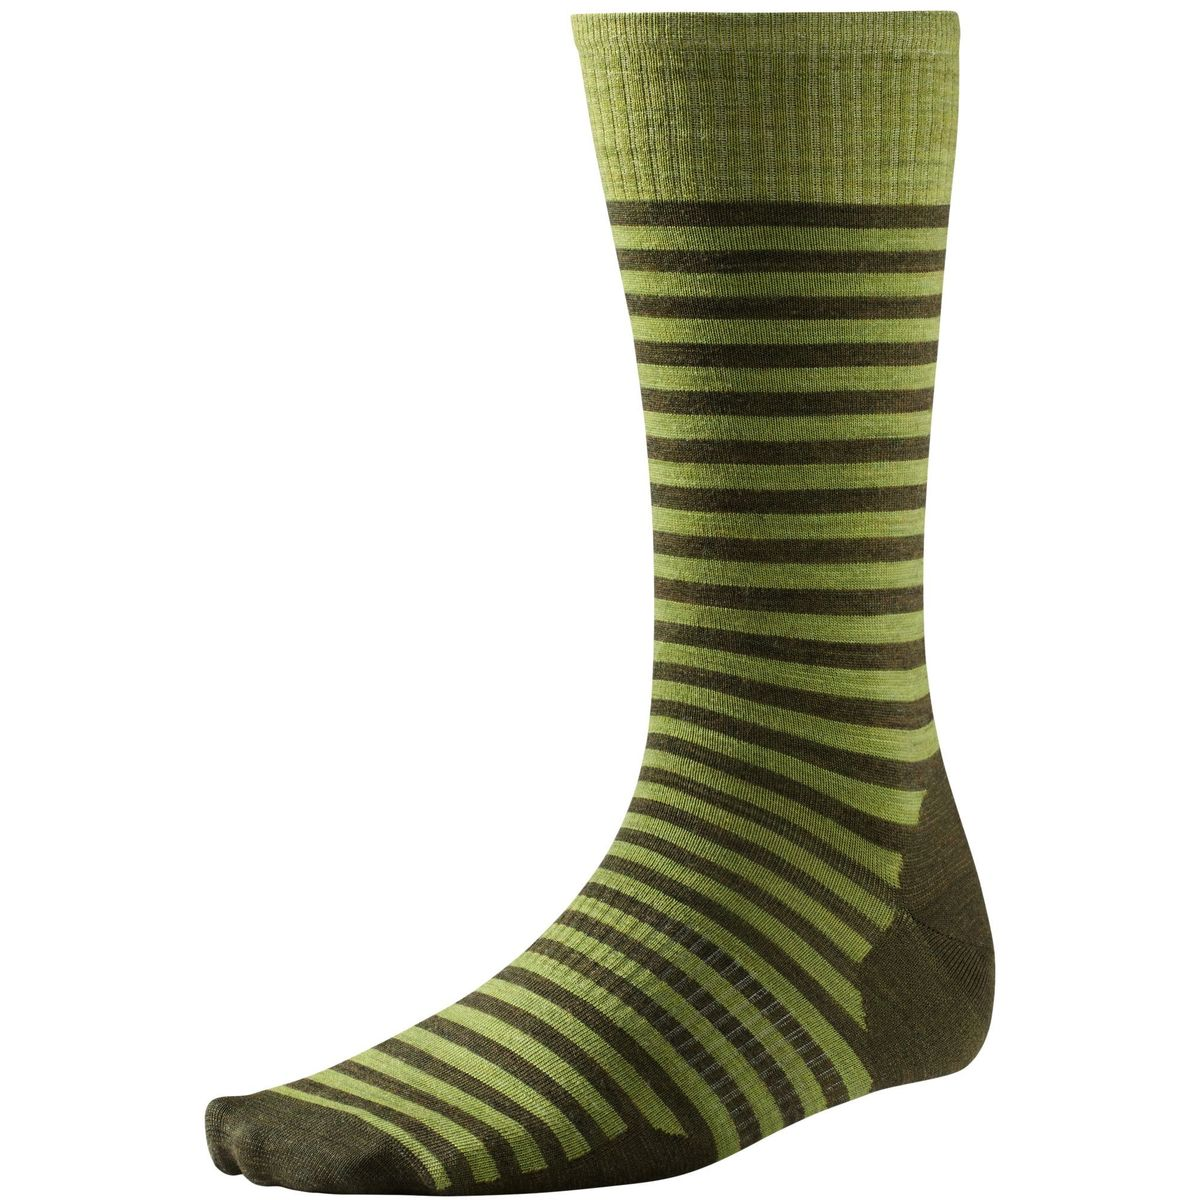 Smartwool Stria薄款UL美丽奴羊毛袜子Crew Sock美产正品现货特价